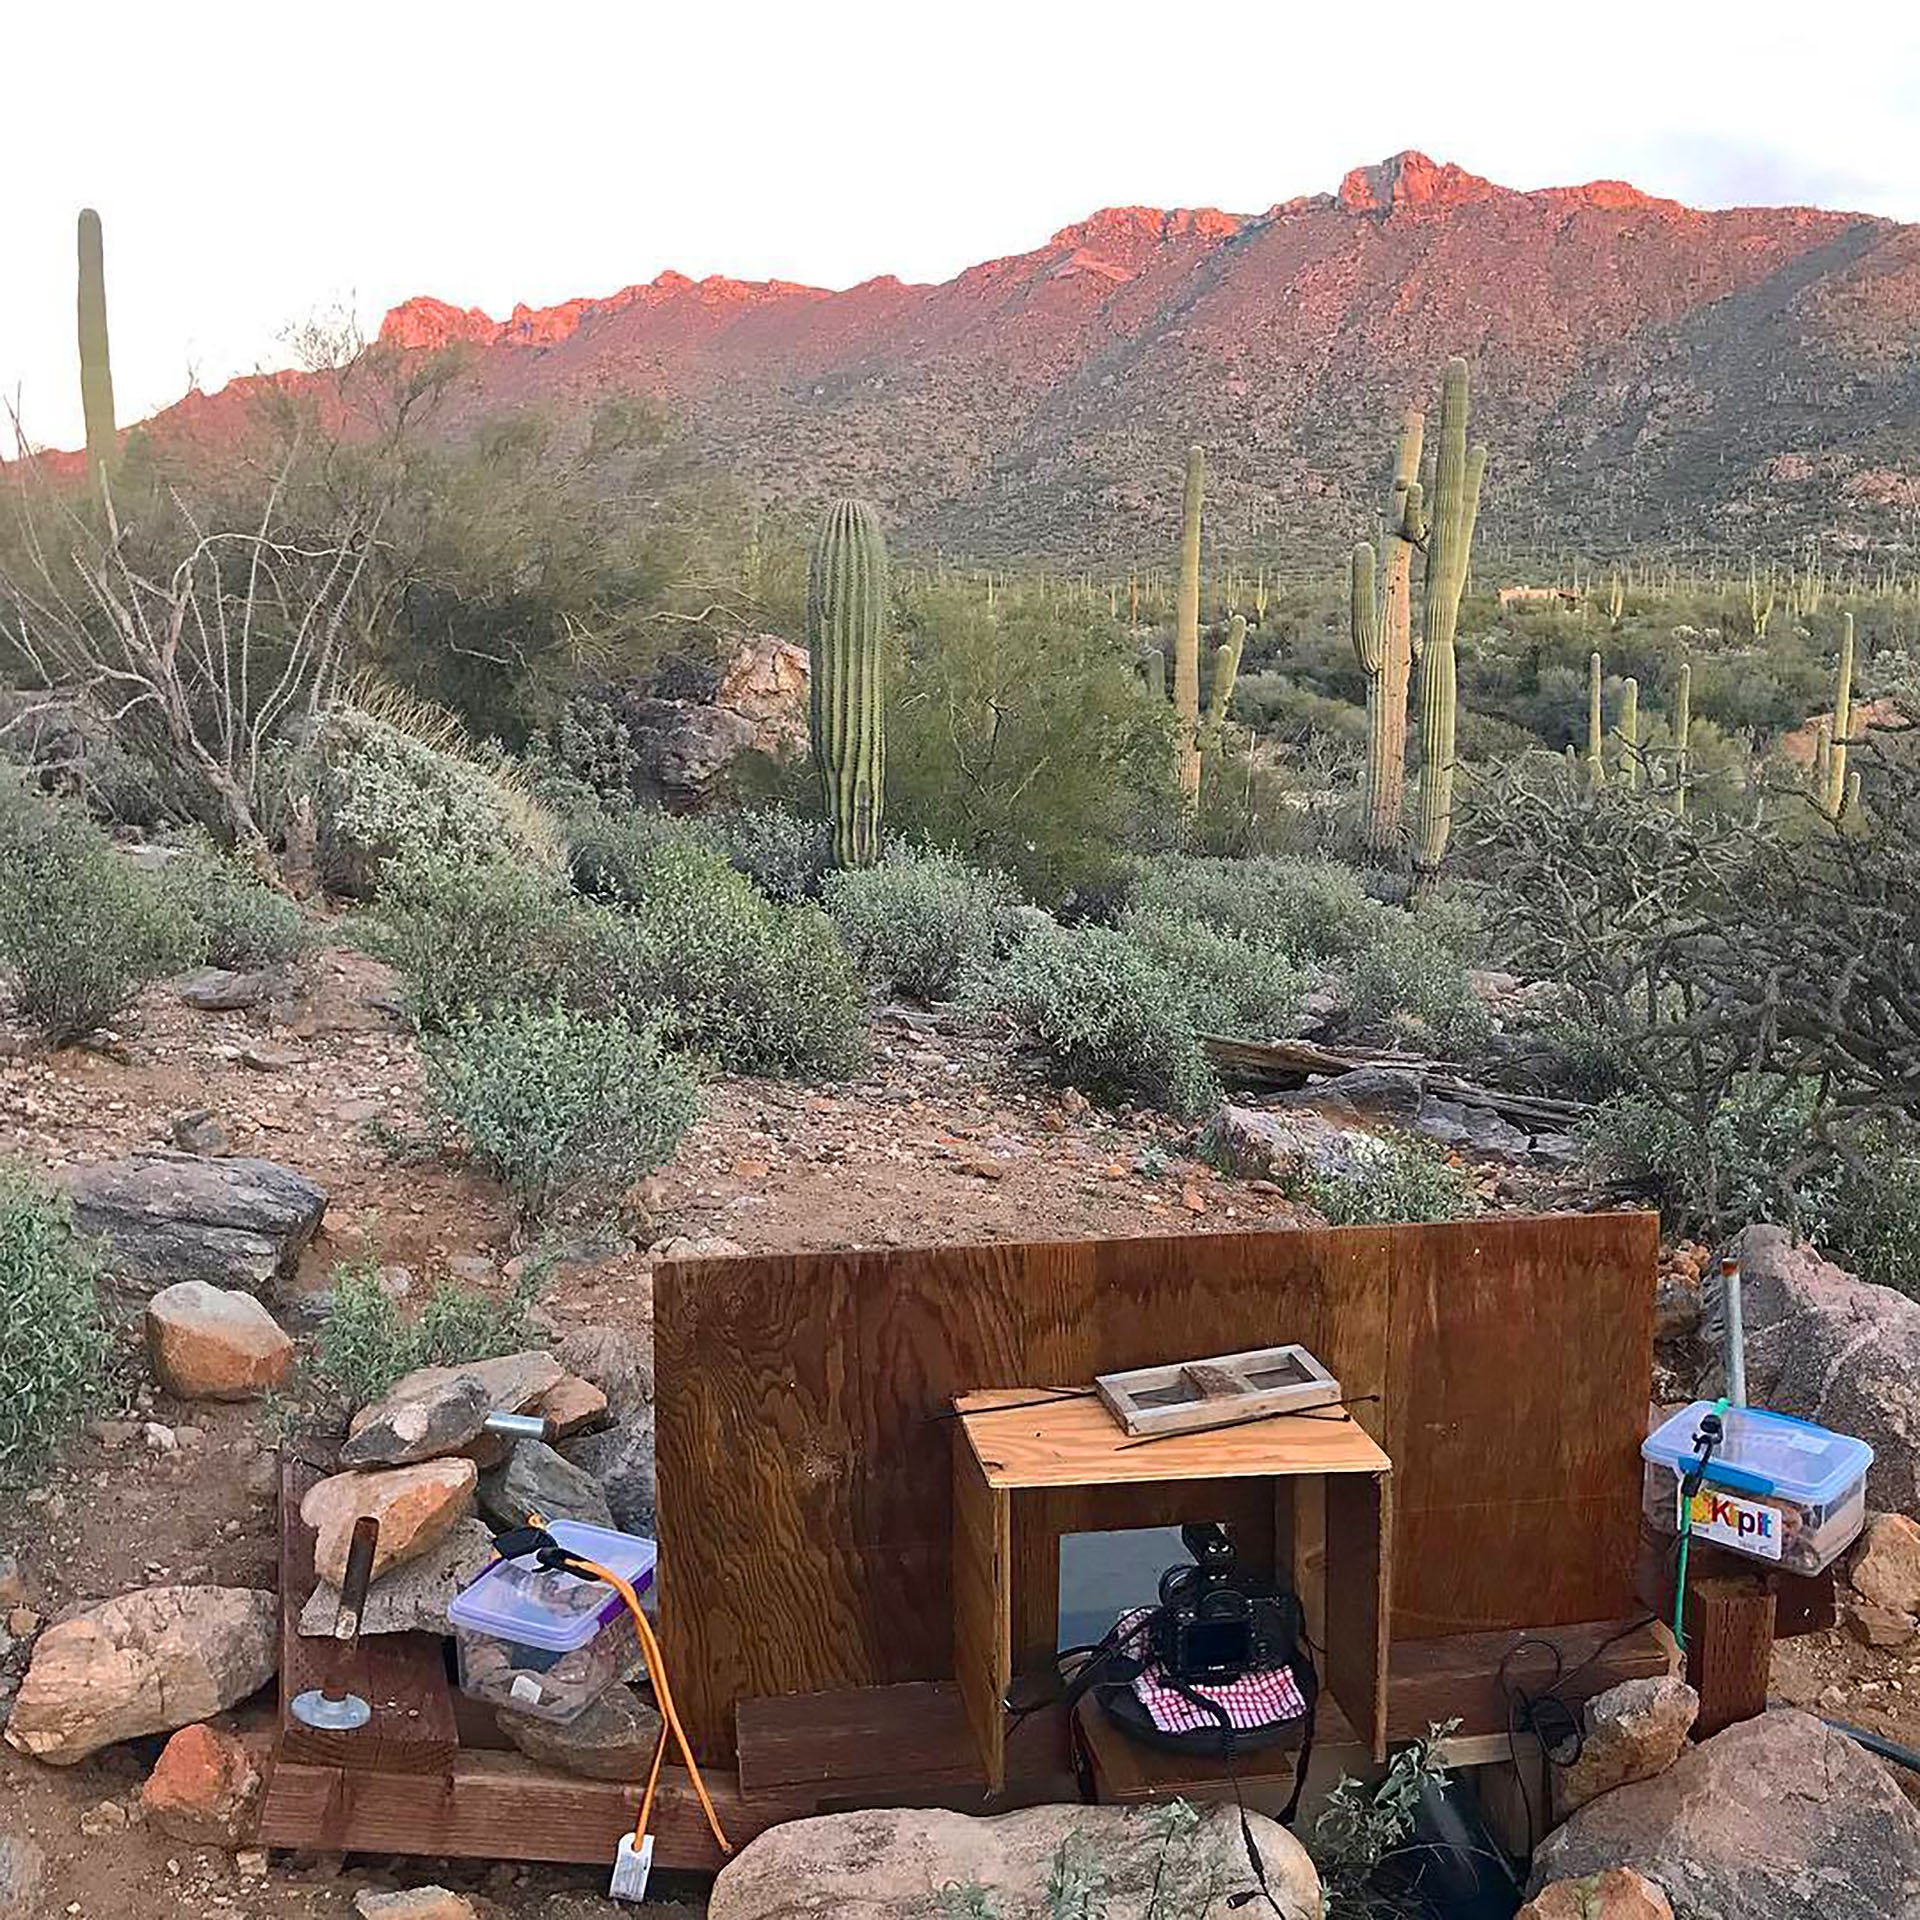 Camera trap setup, Desert Photo Retreat, near Tucson, Arizona.